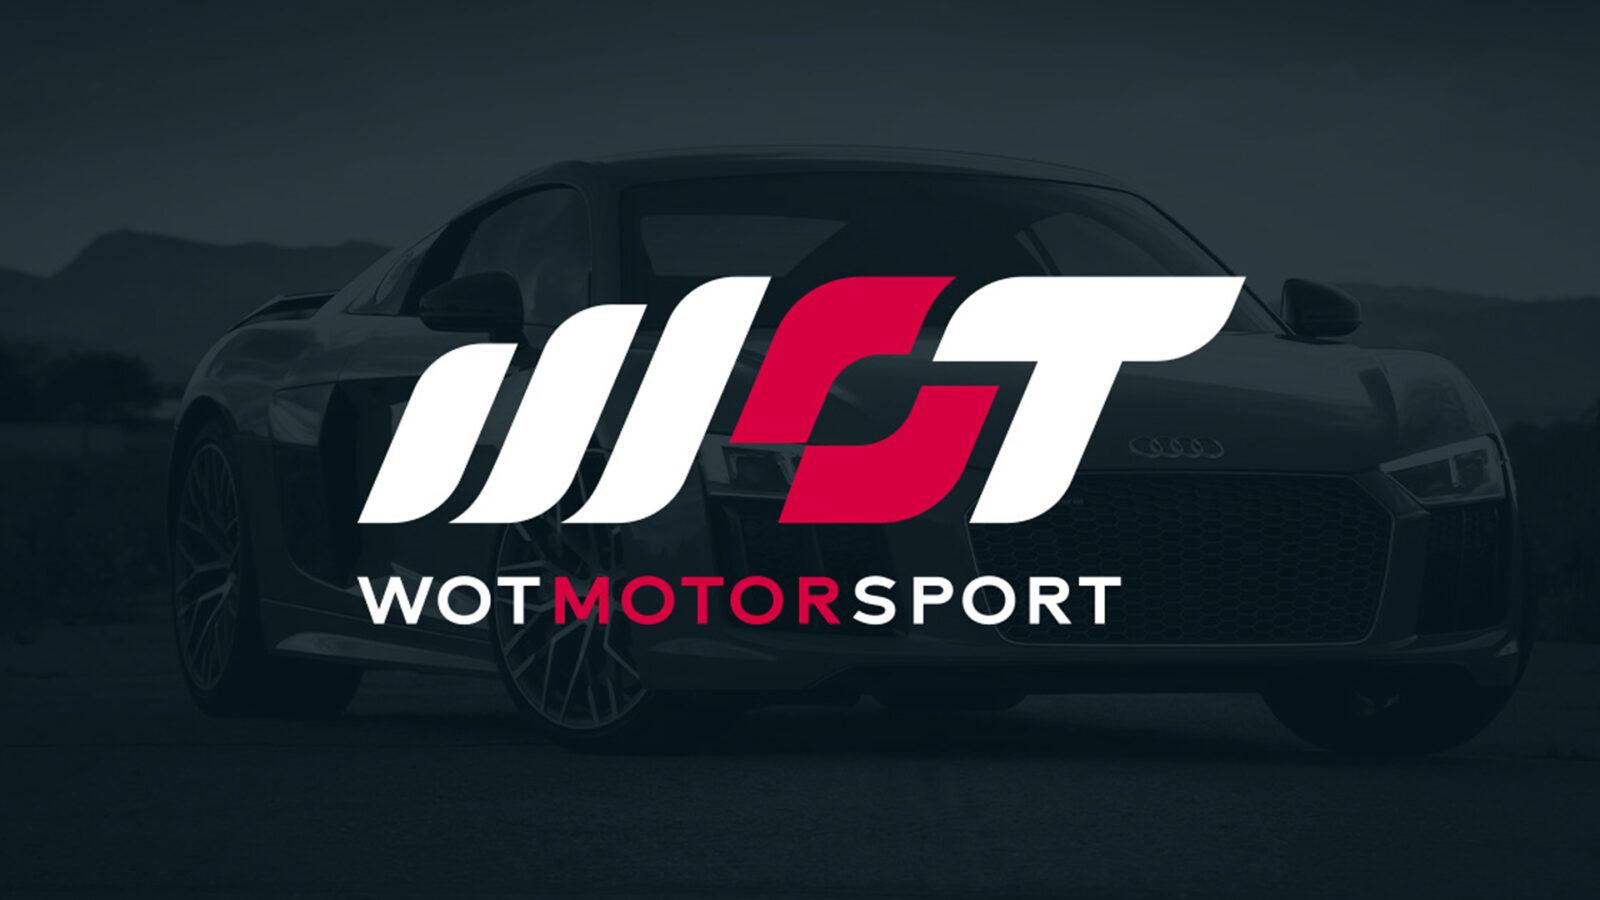 Wot Motorsport